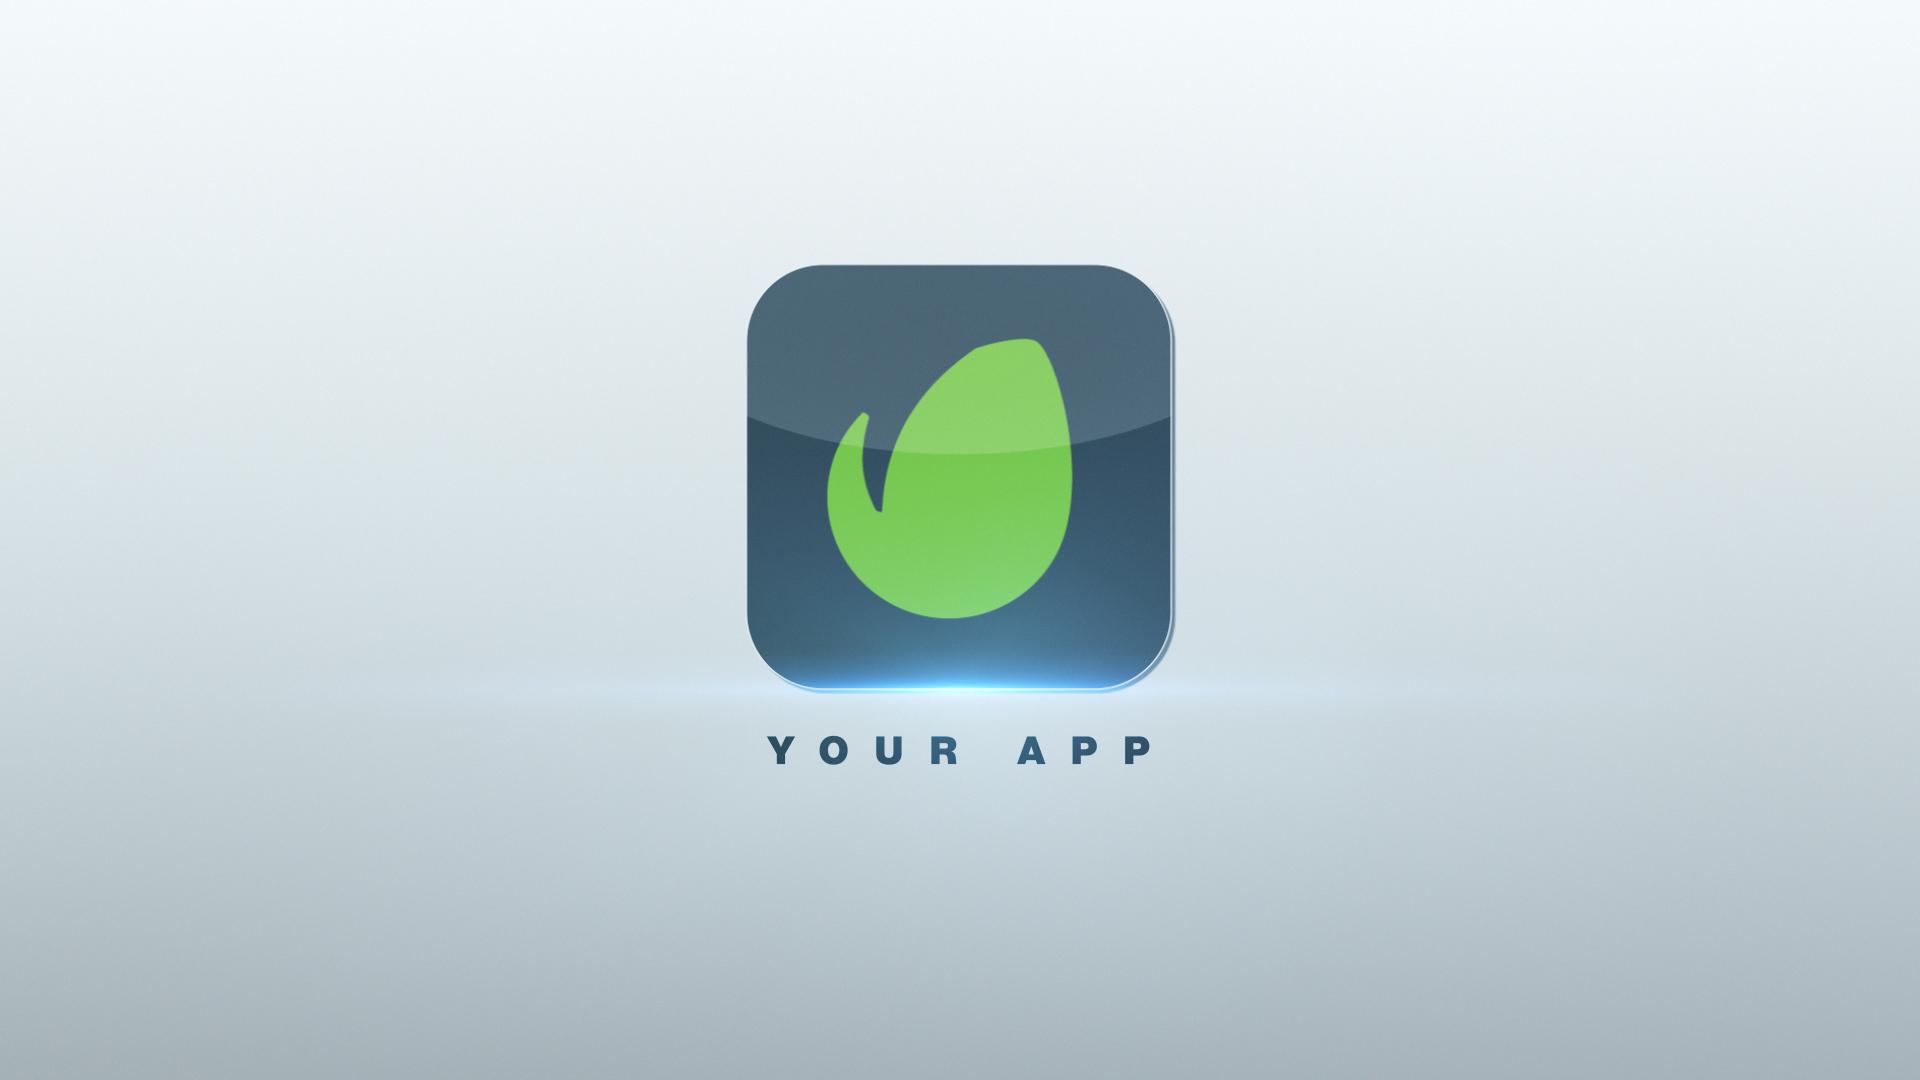 Phone_App_Promo_Kit_1080p_00091